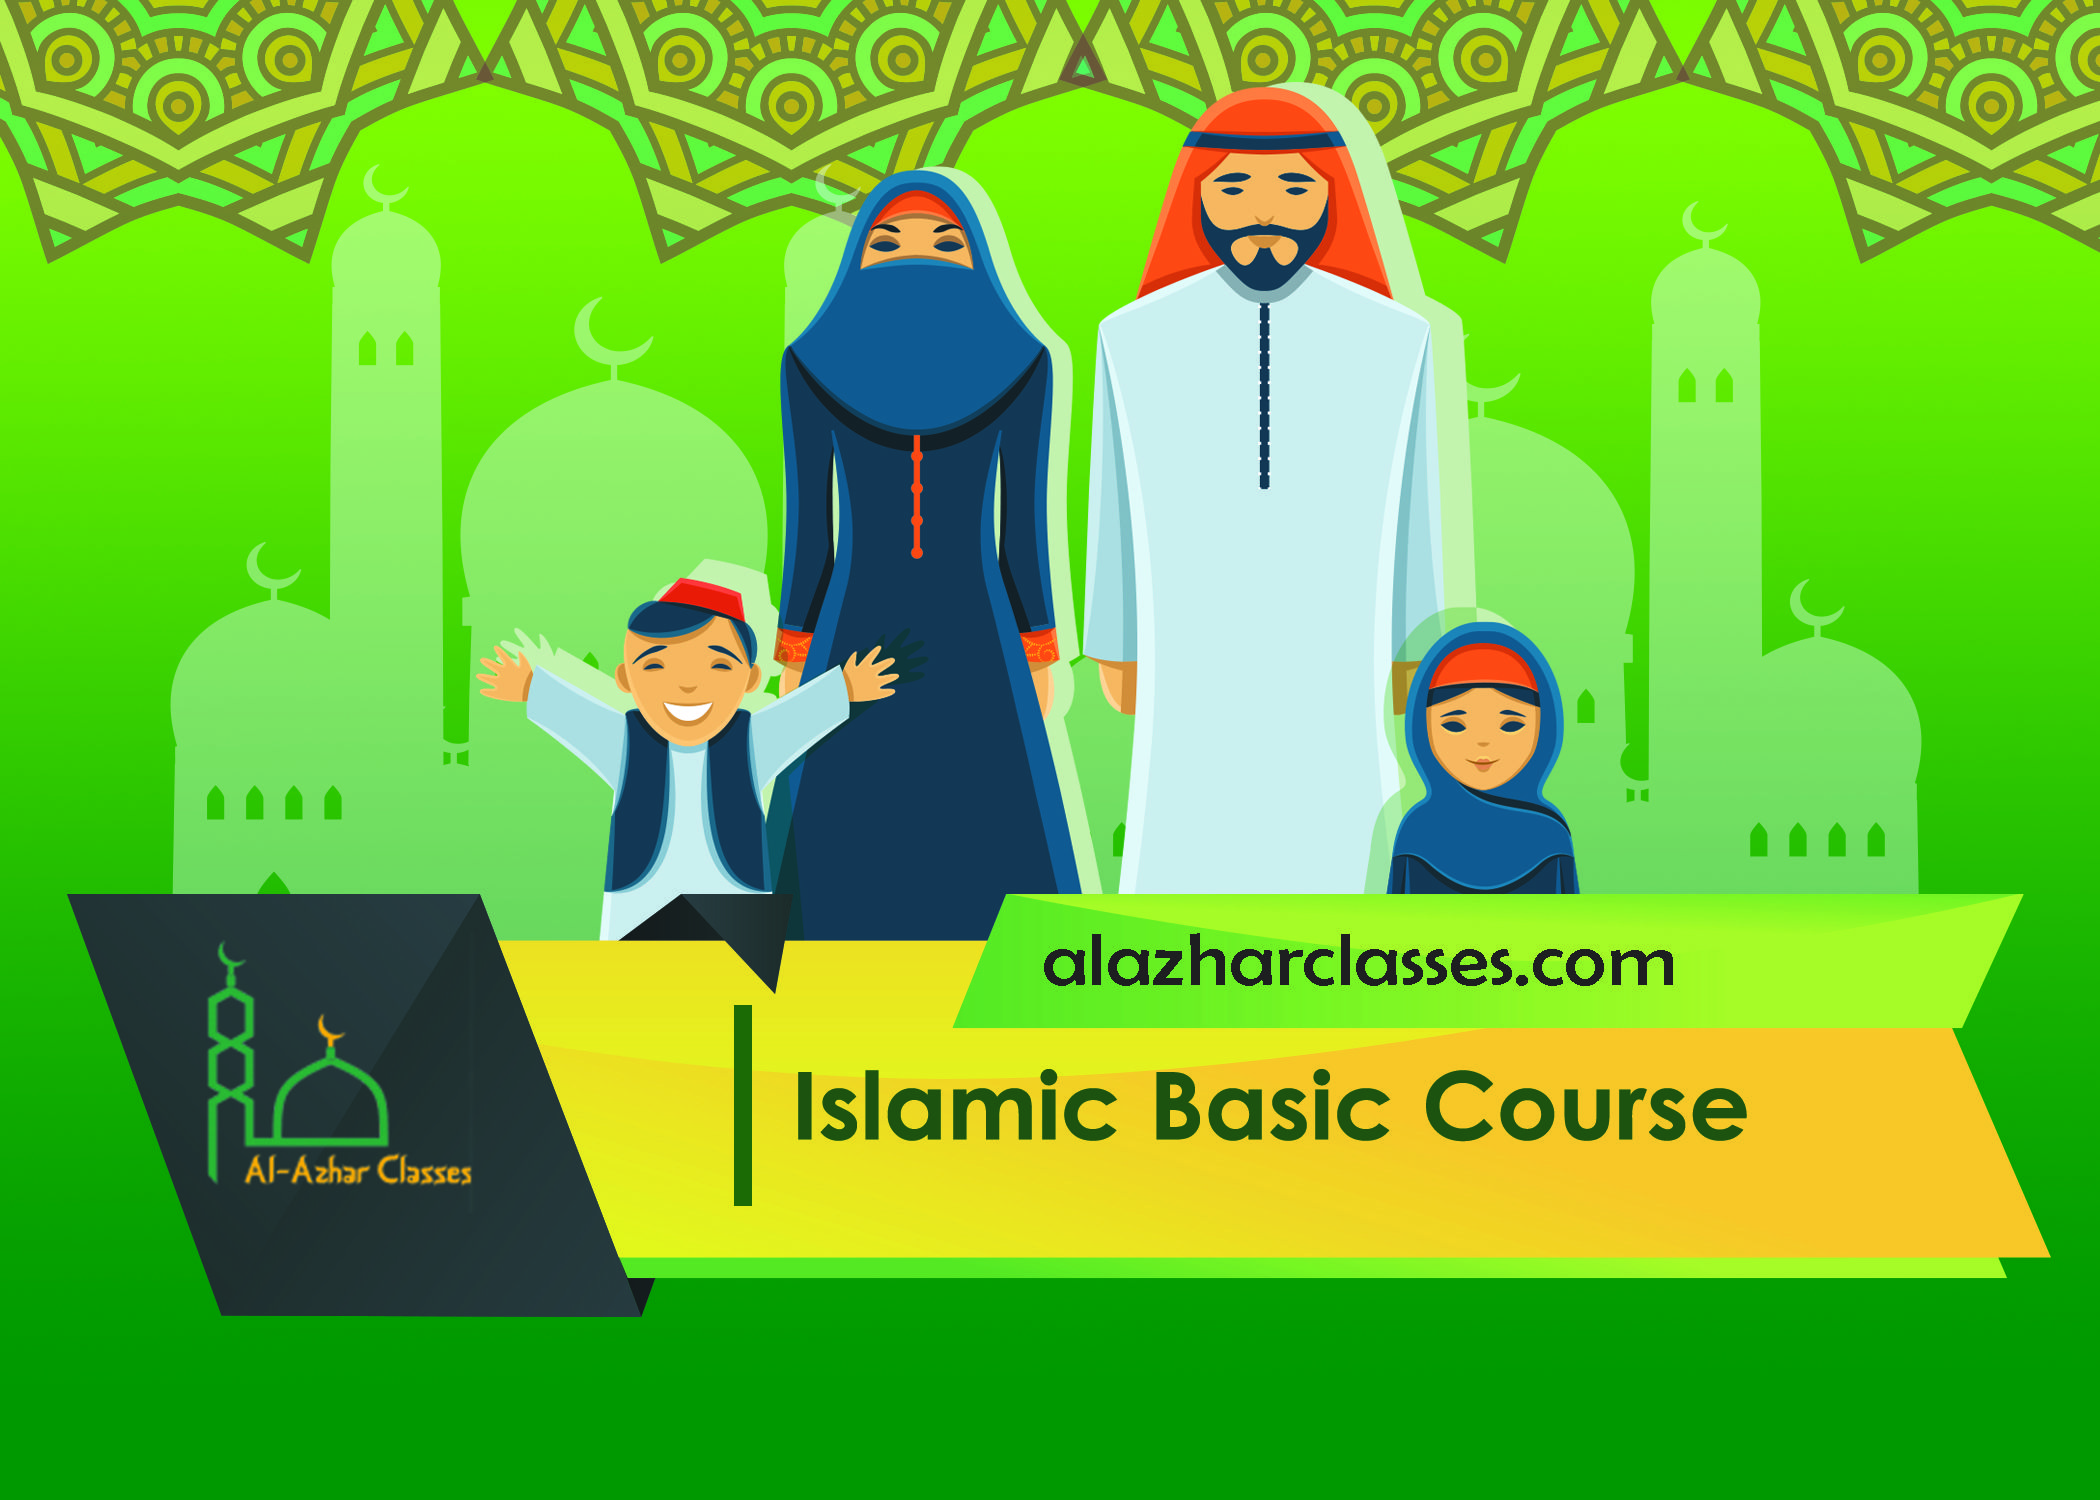 Islamic basic course